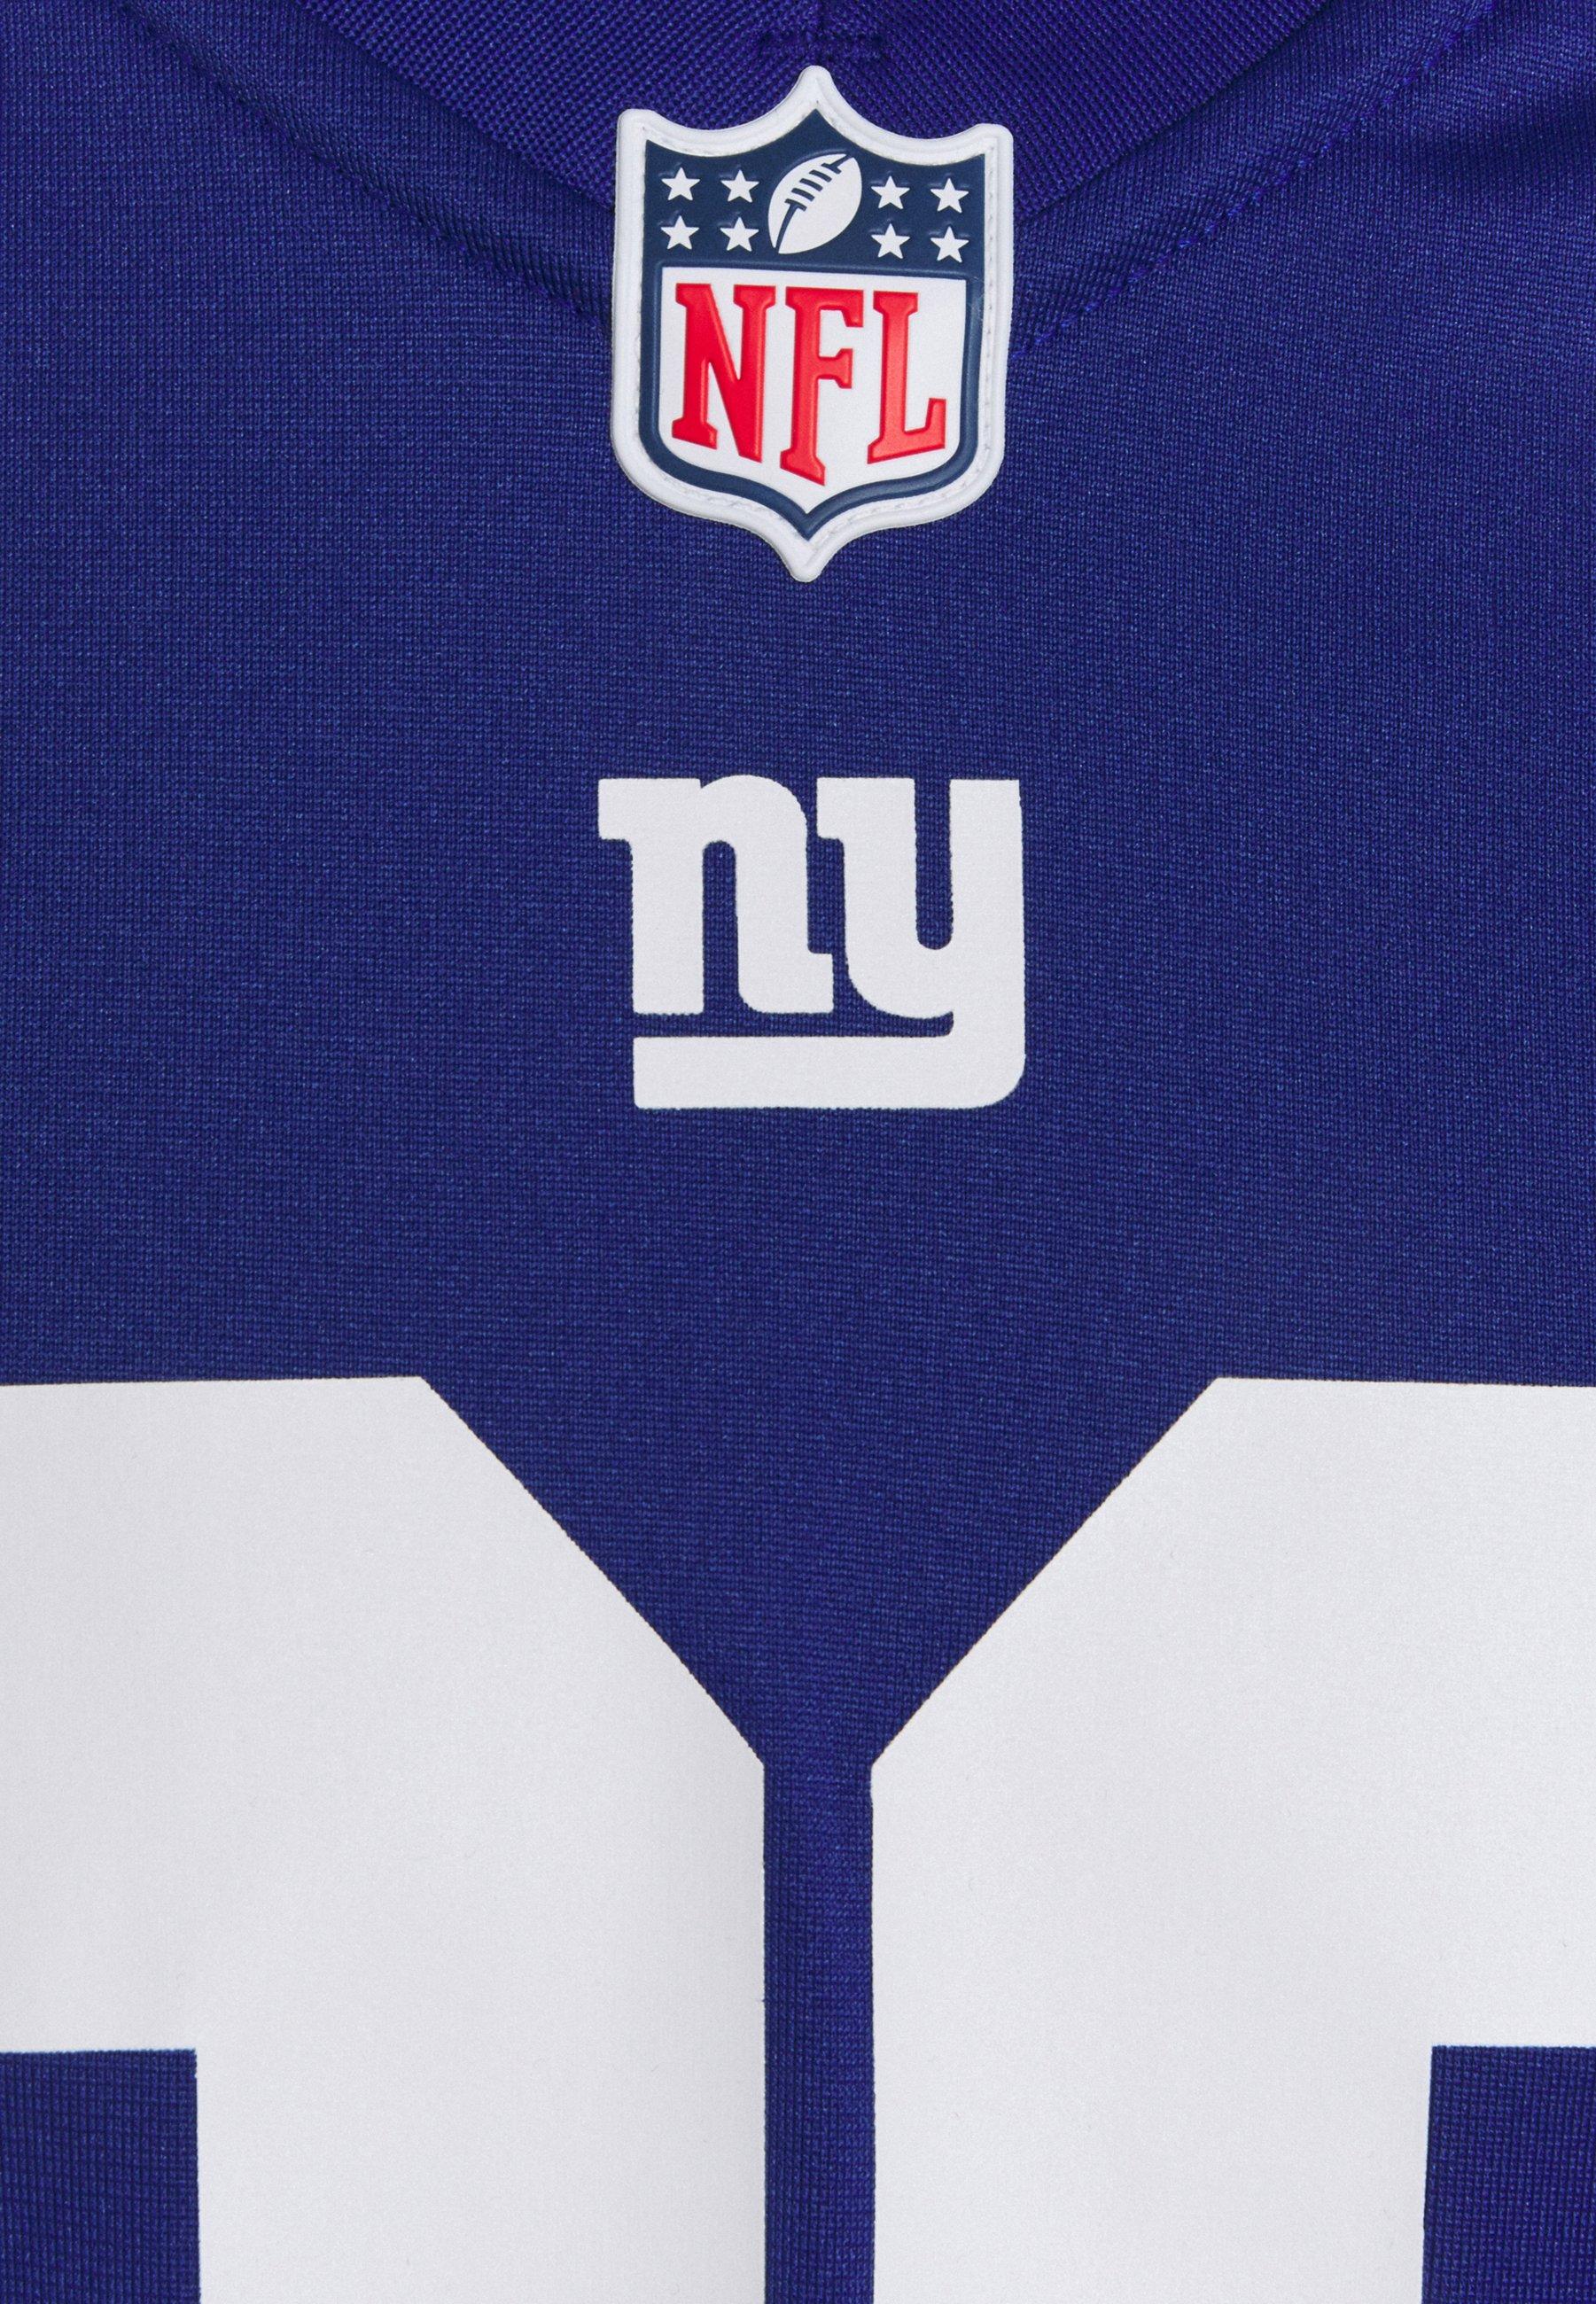 NFL NEW YORK GIANTS SAQUON BARKLEY GAME TEAM Vereinsmannschaften rush blue